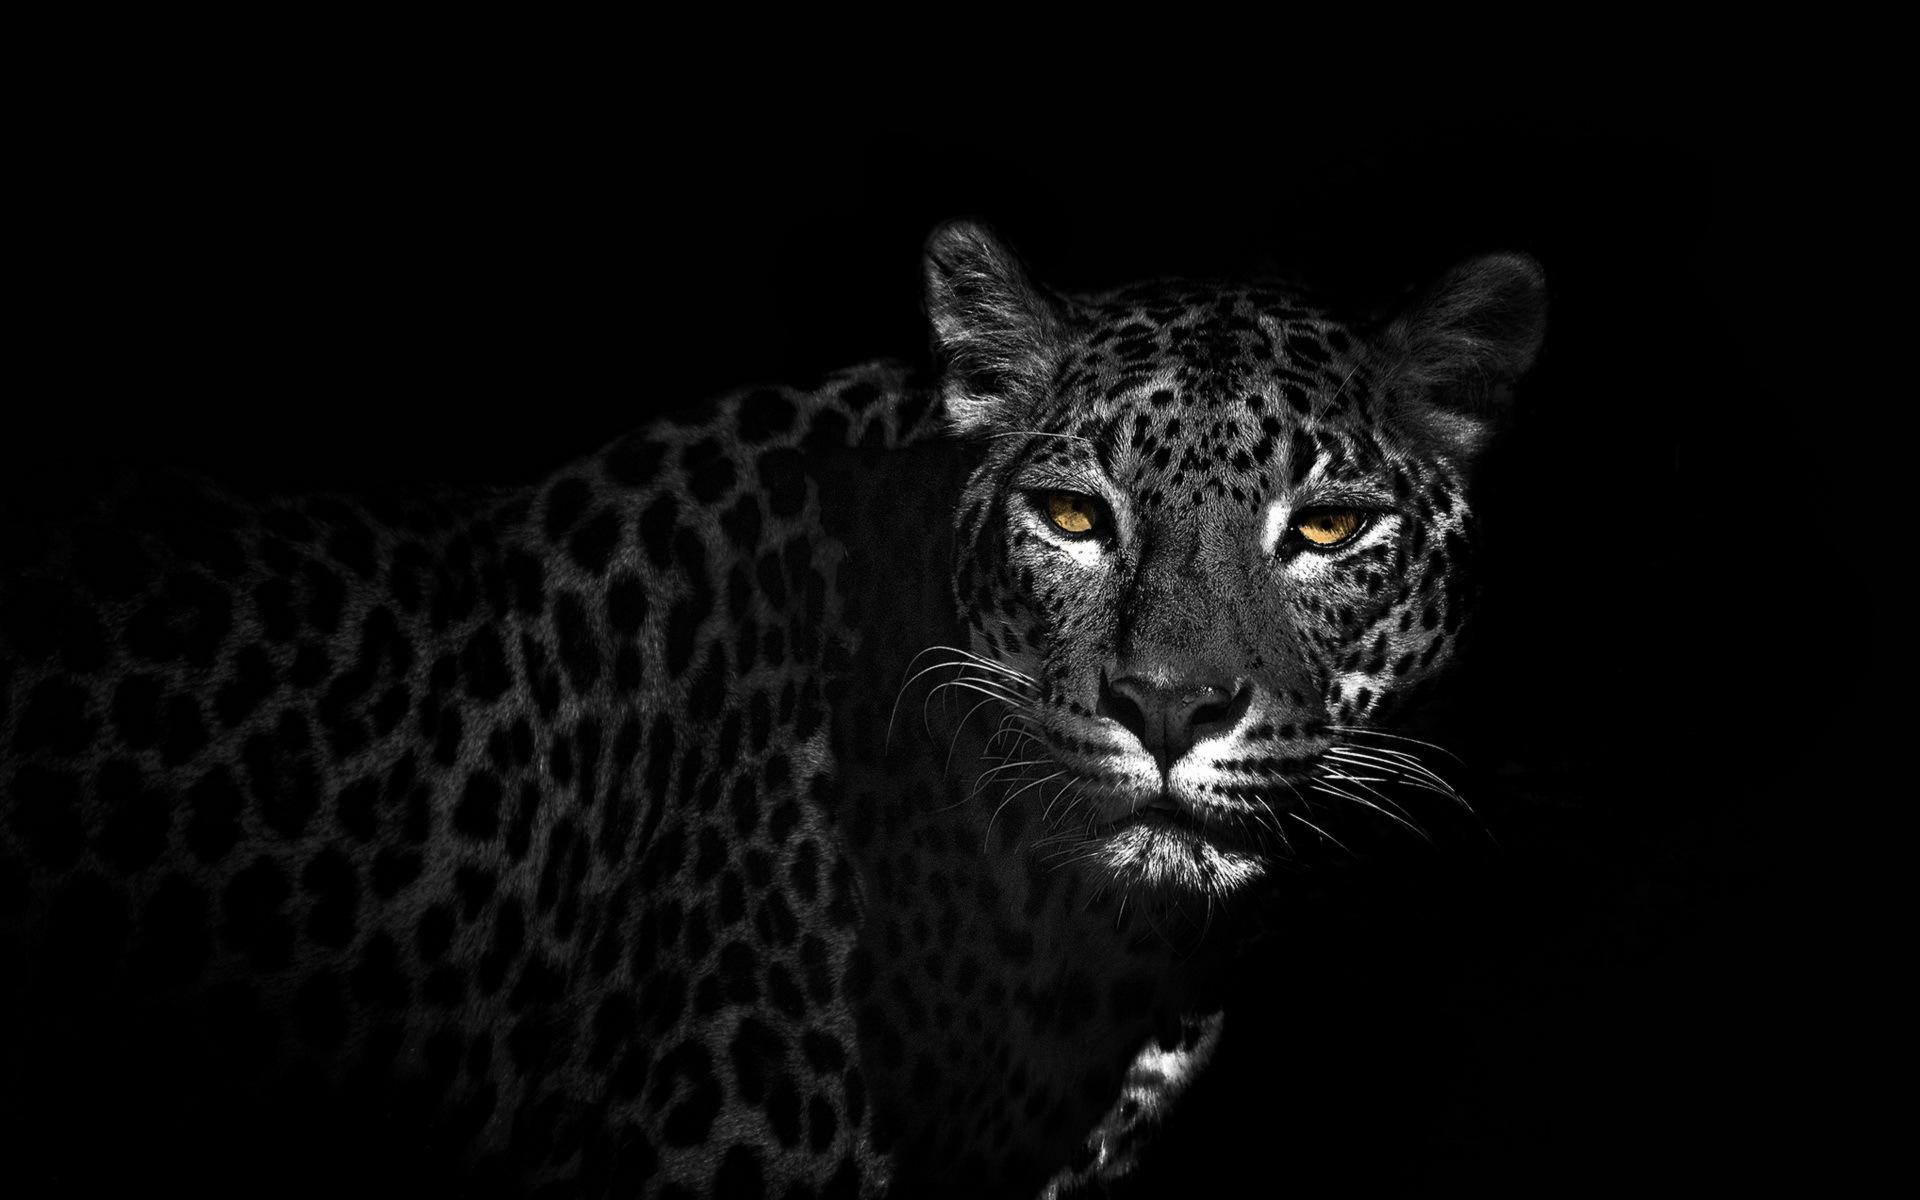 Animal Para Fondo De Pantalla: Leopardo Full HD Fondo De Pantalla And Fondo De Escritorio